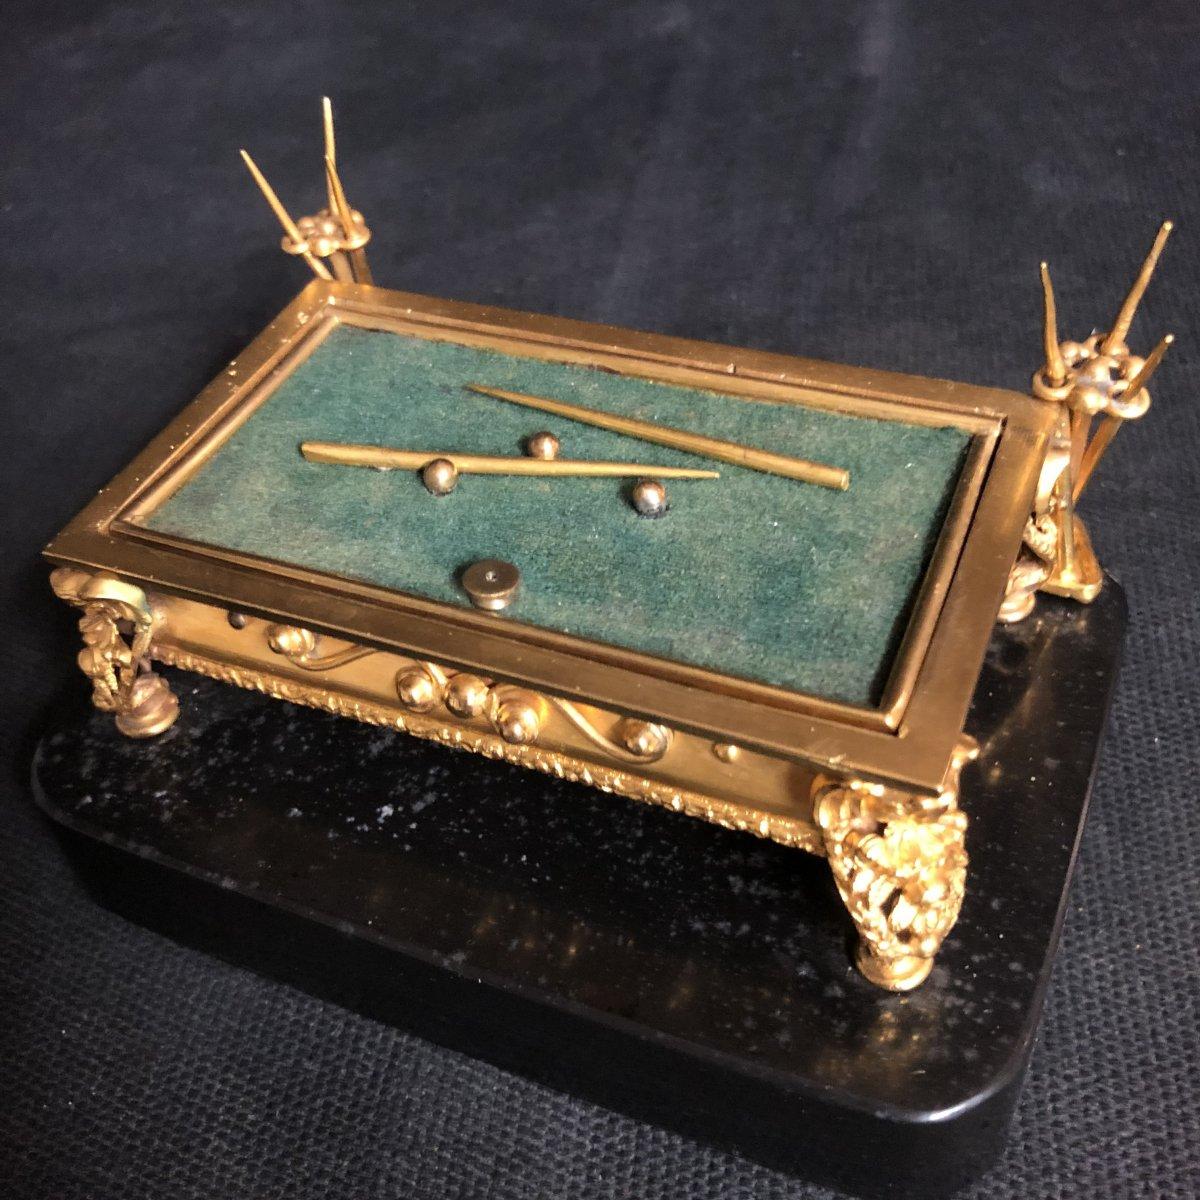 TRES RARE ENCRIER DE BUREAU en forme de BILLARD bronze doré début XIXe